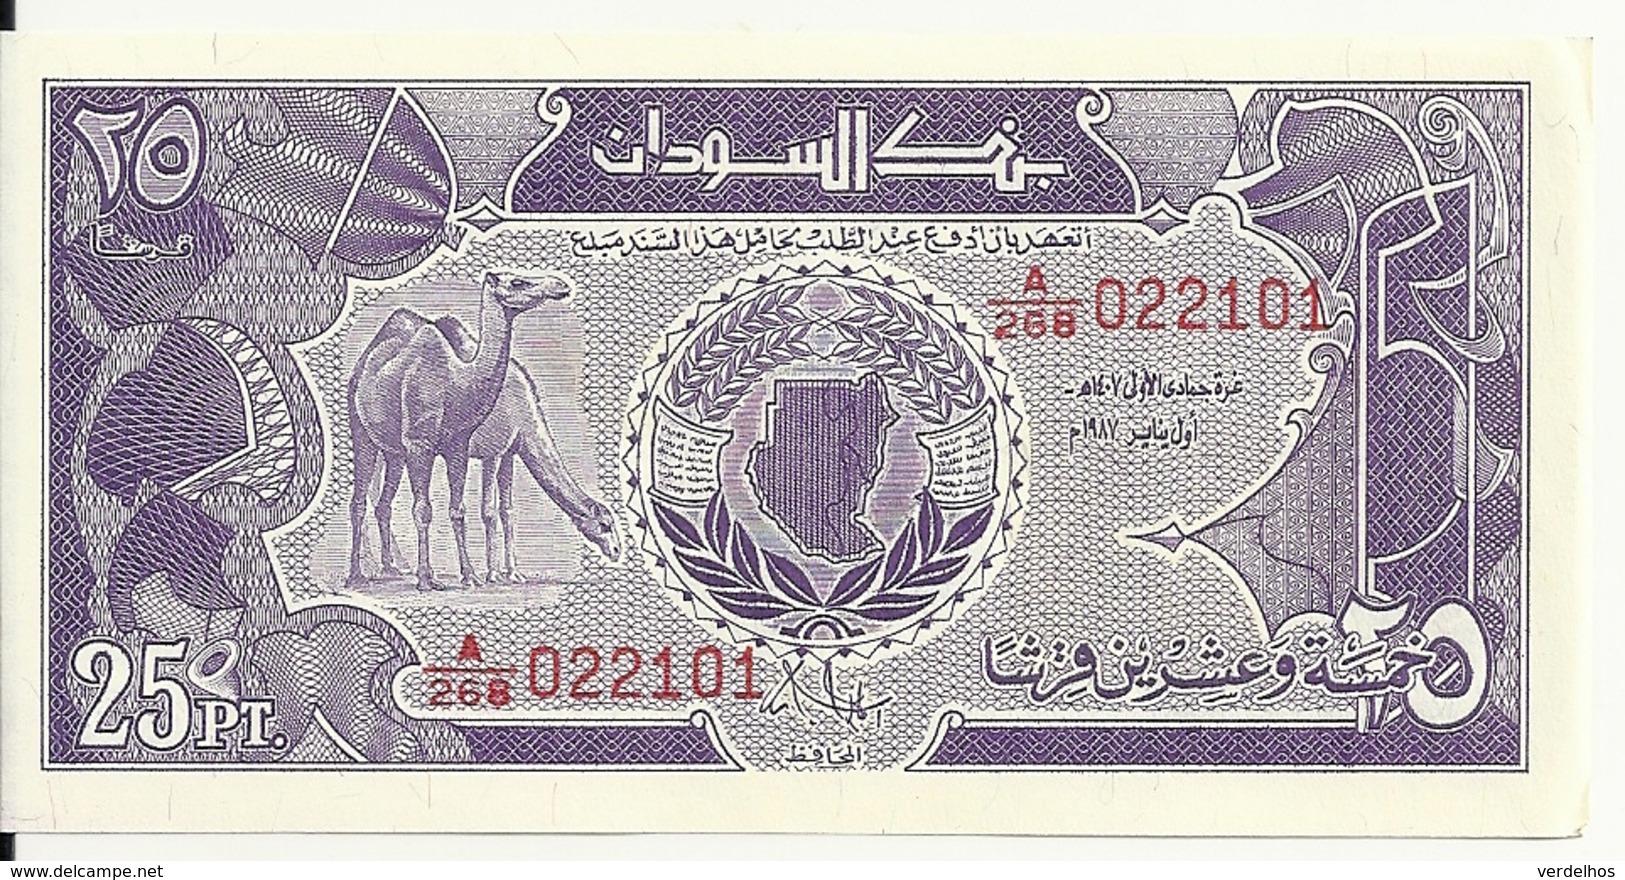 SOUDAN 25 PIASTRES 1985 AUNC P 37 - Soudan